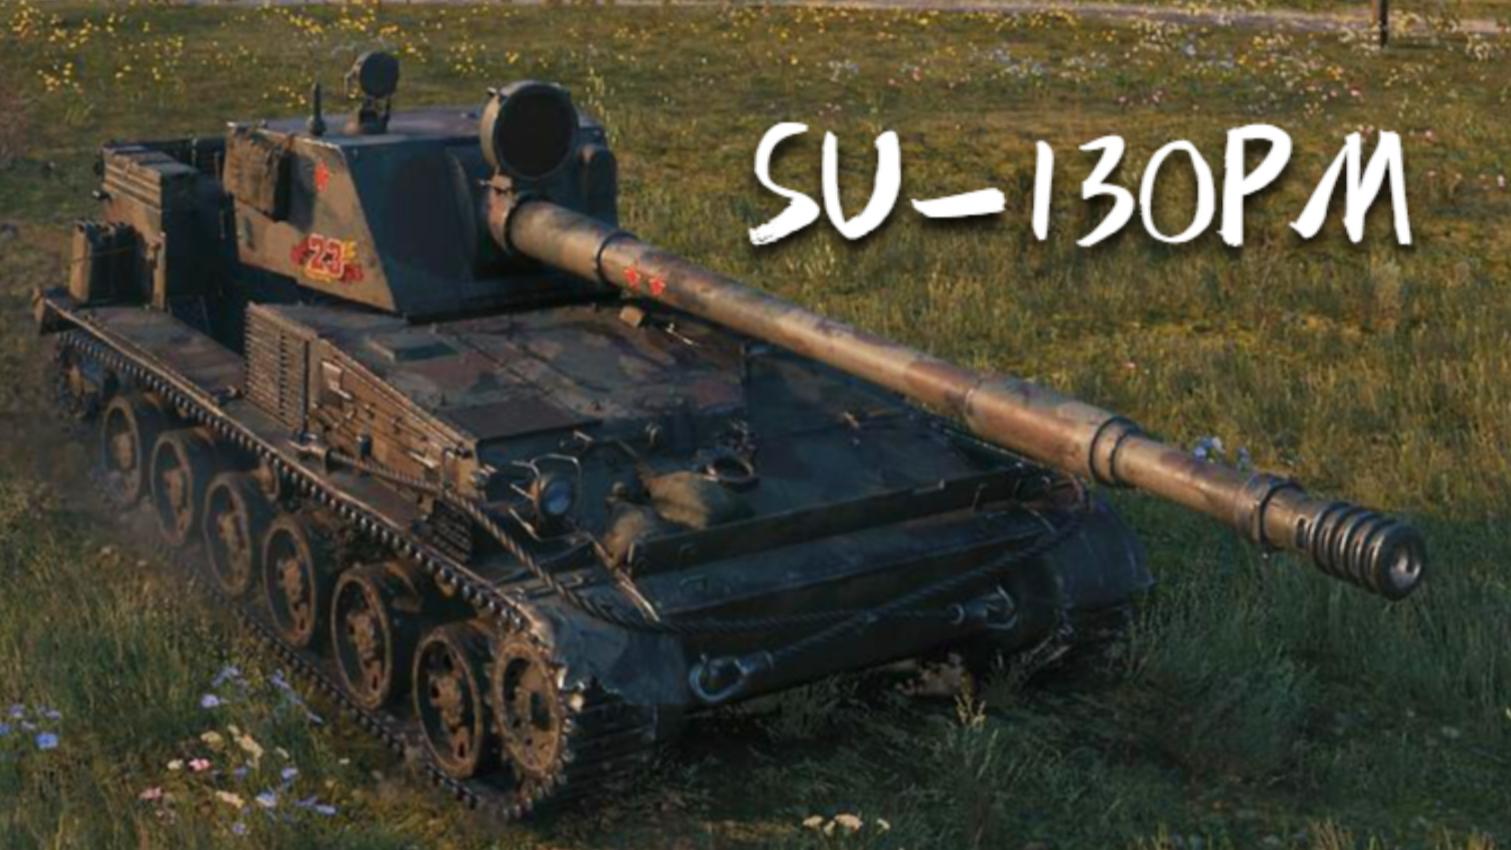 【坦克世界】SU-130PM - 10杀 - 8千输出